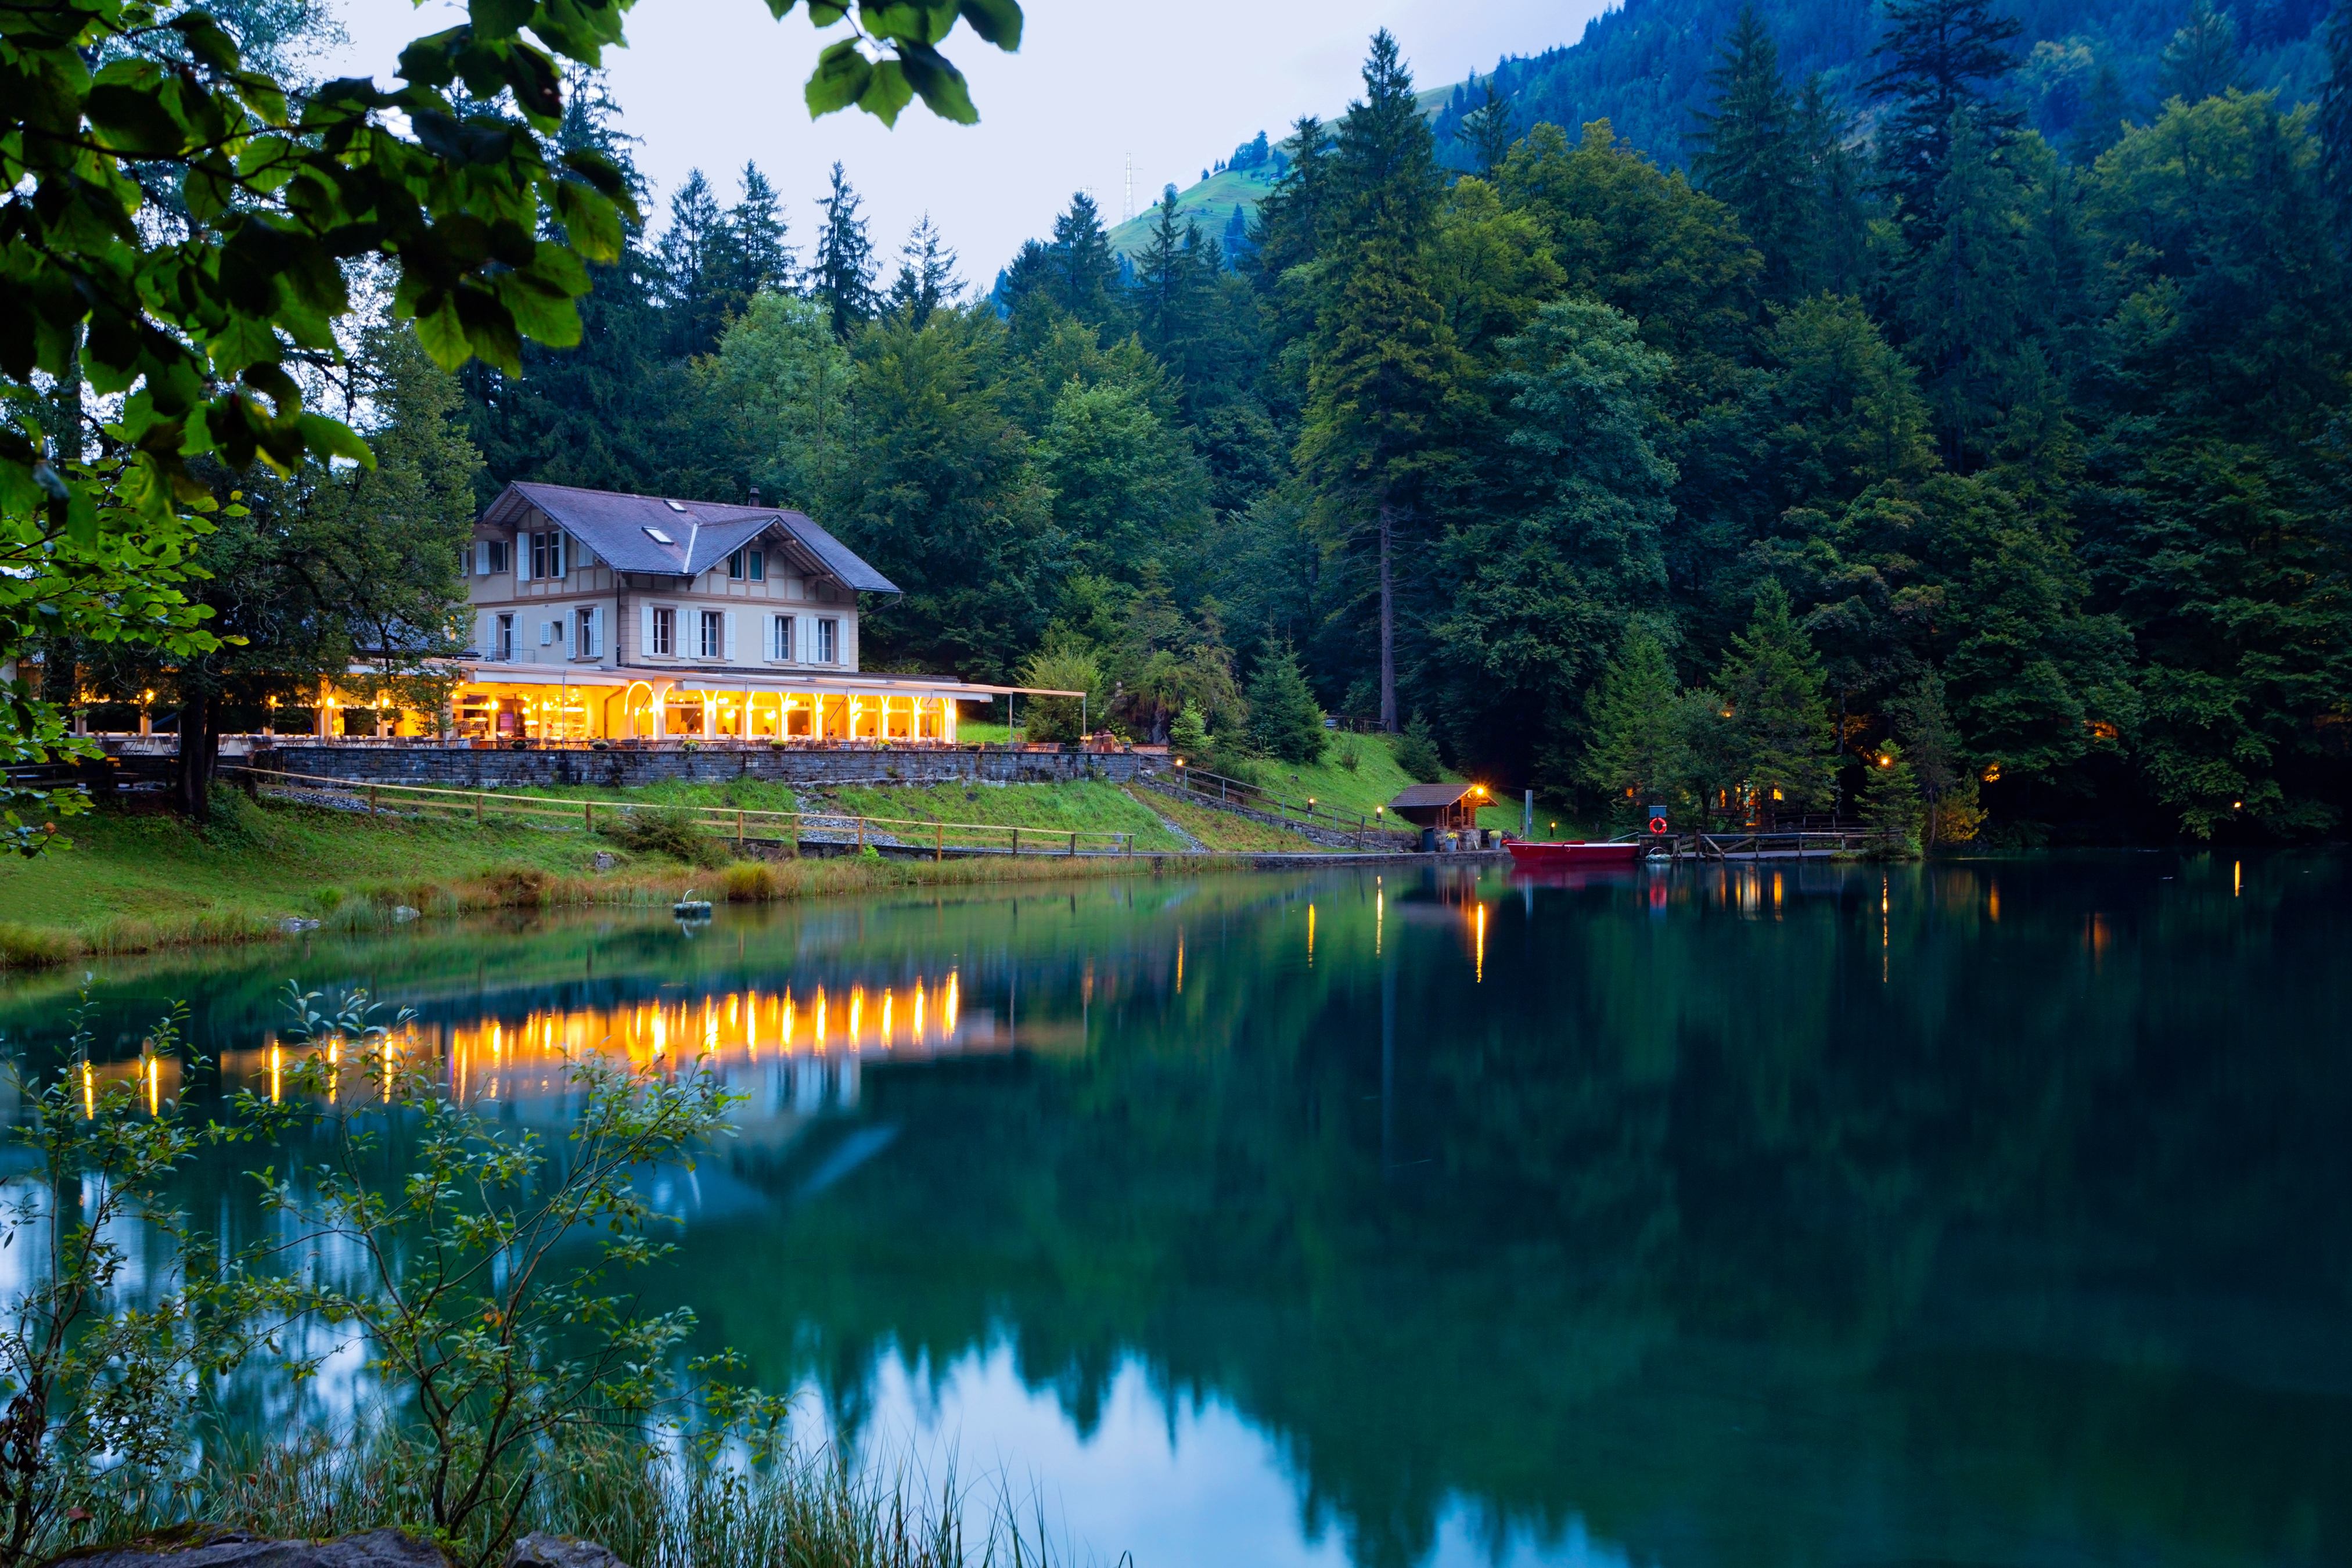 домик на берегу озера бесплатно